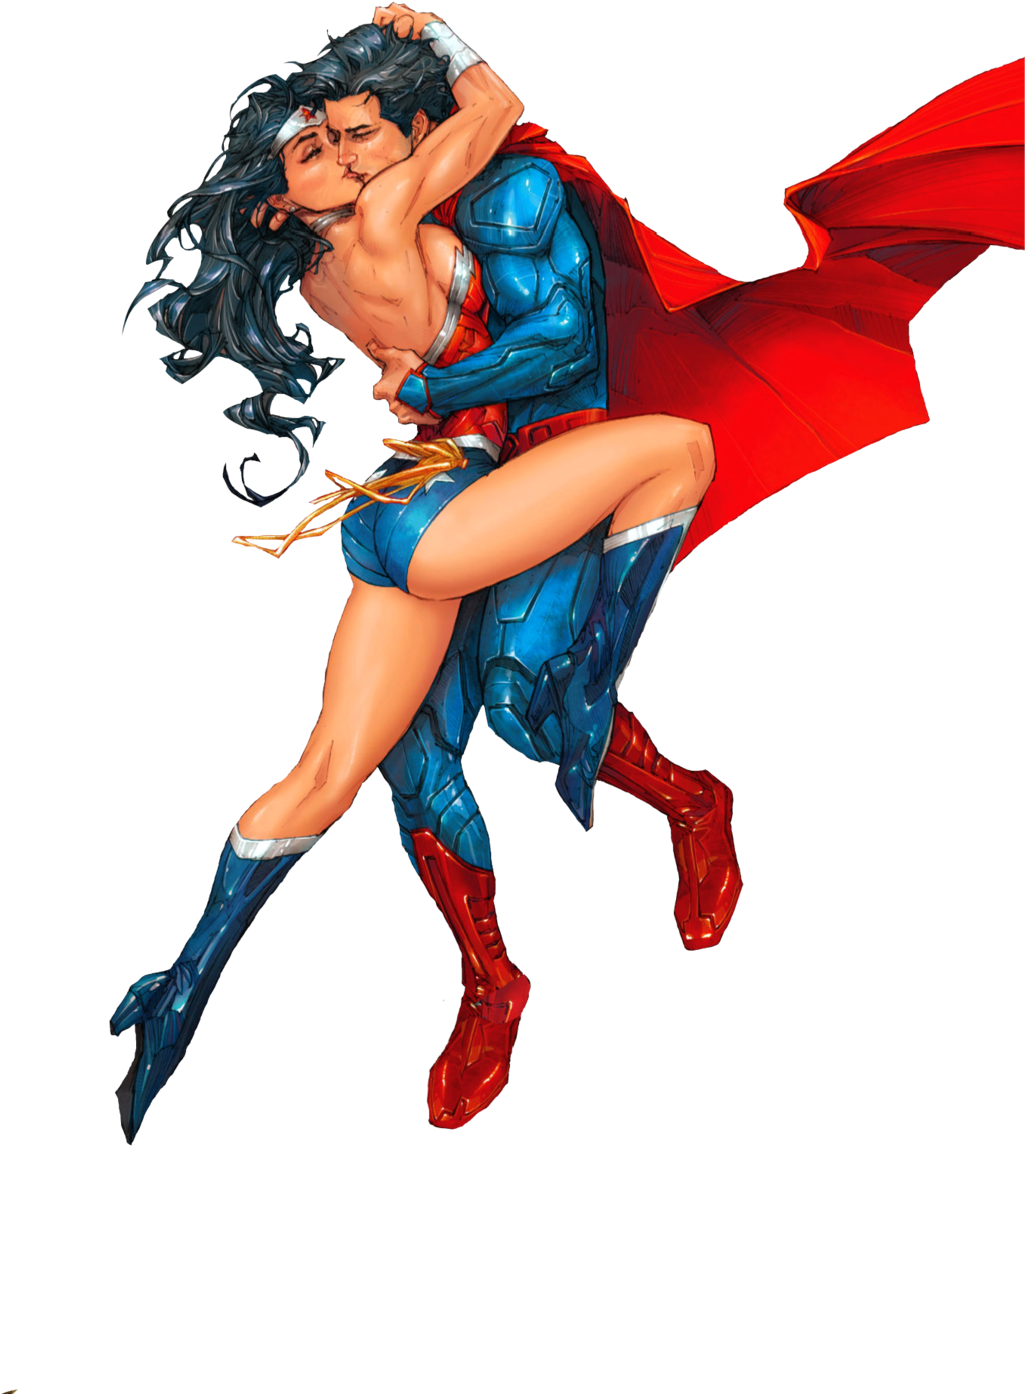 Картинка супермен с девушкой